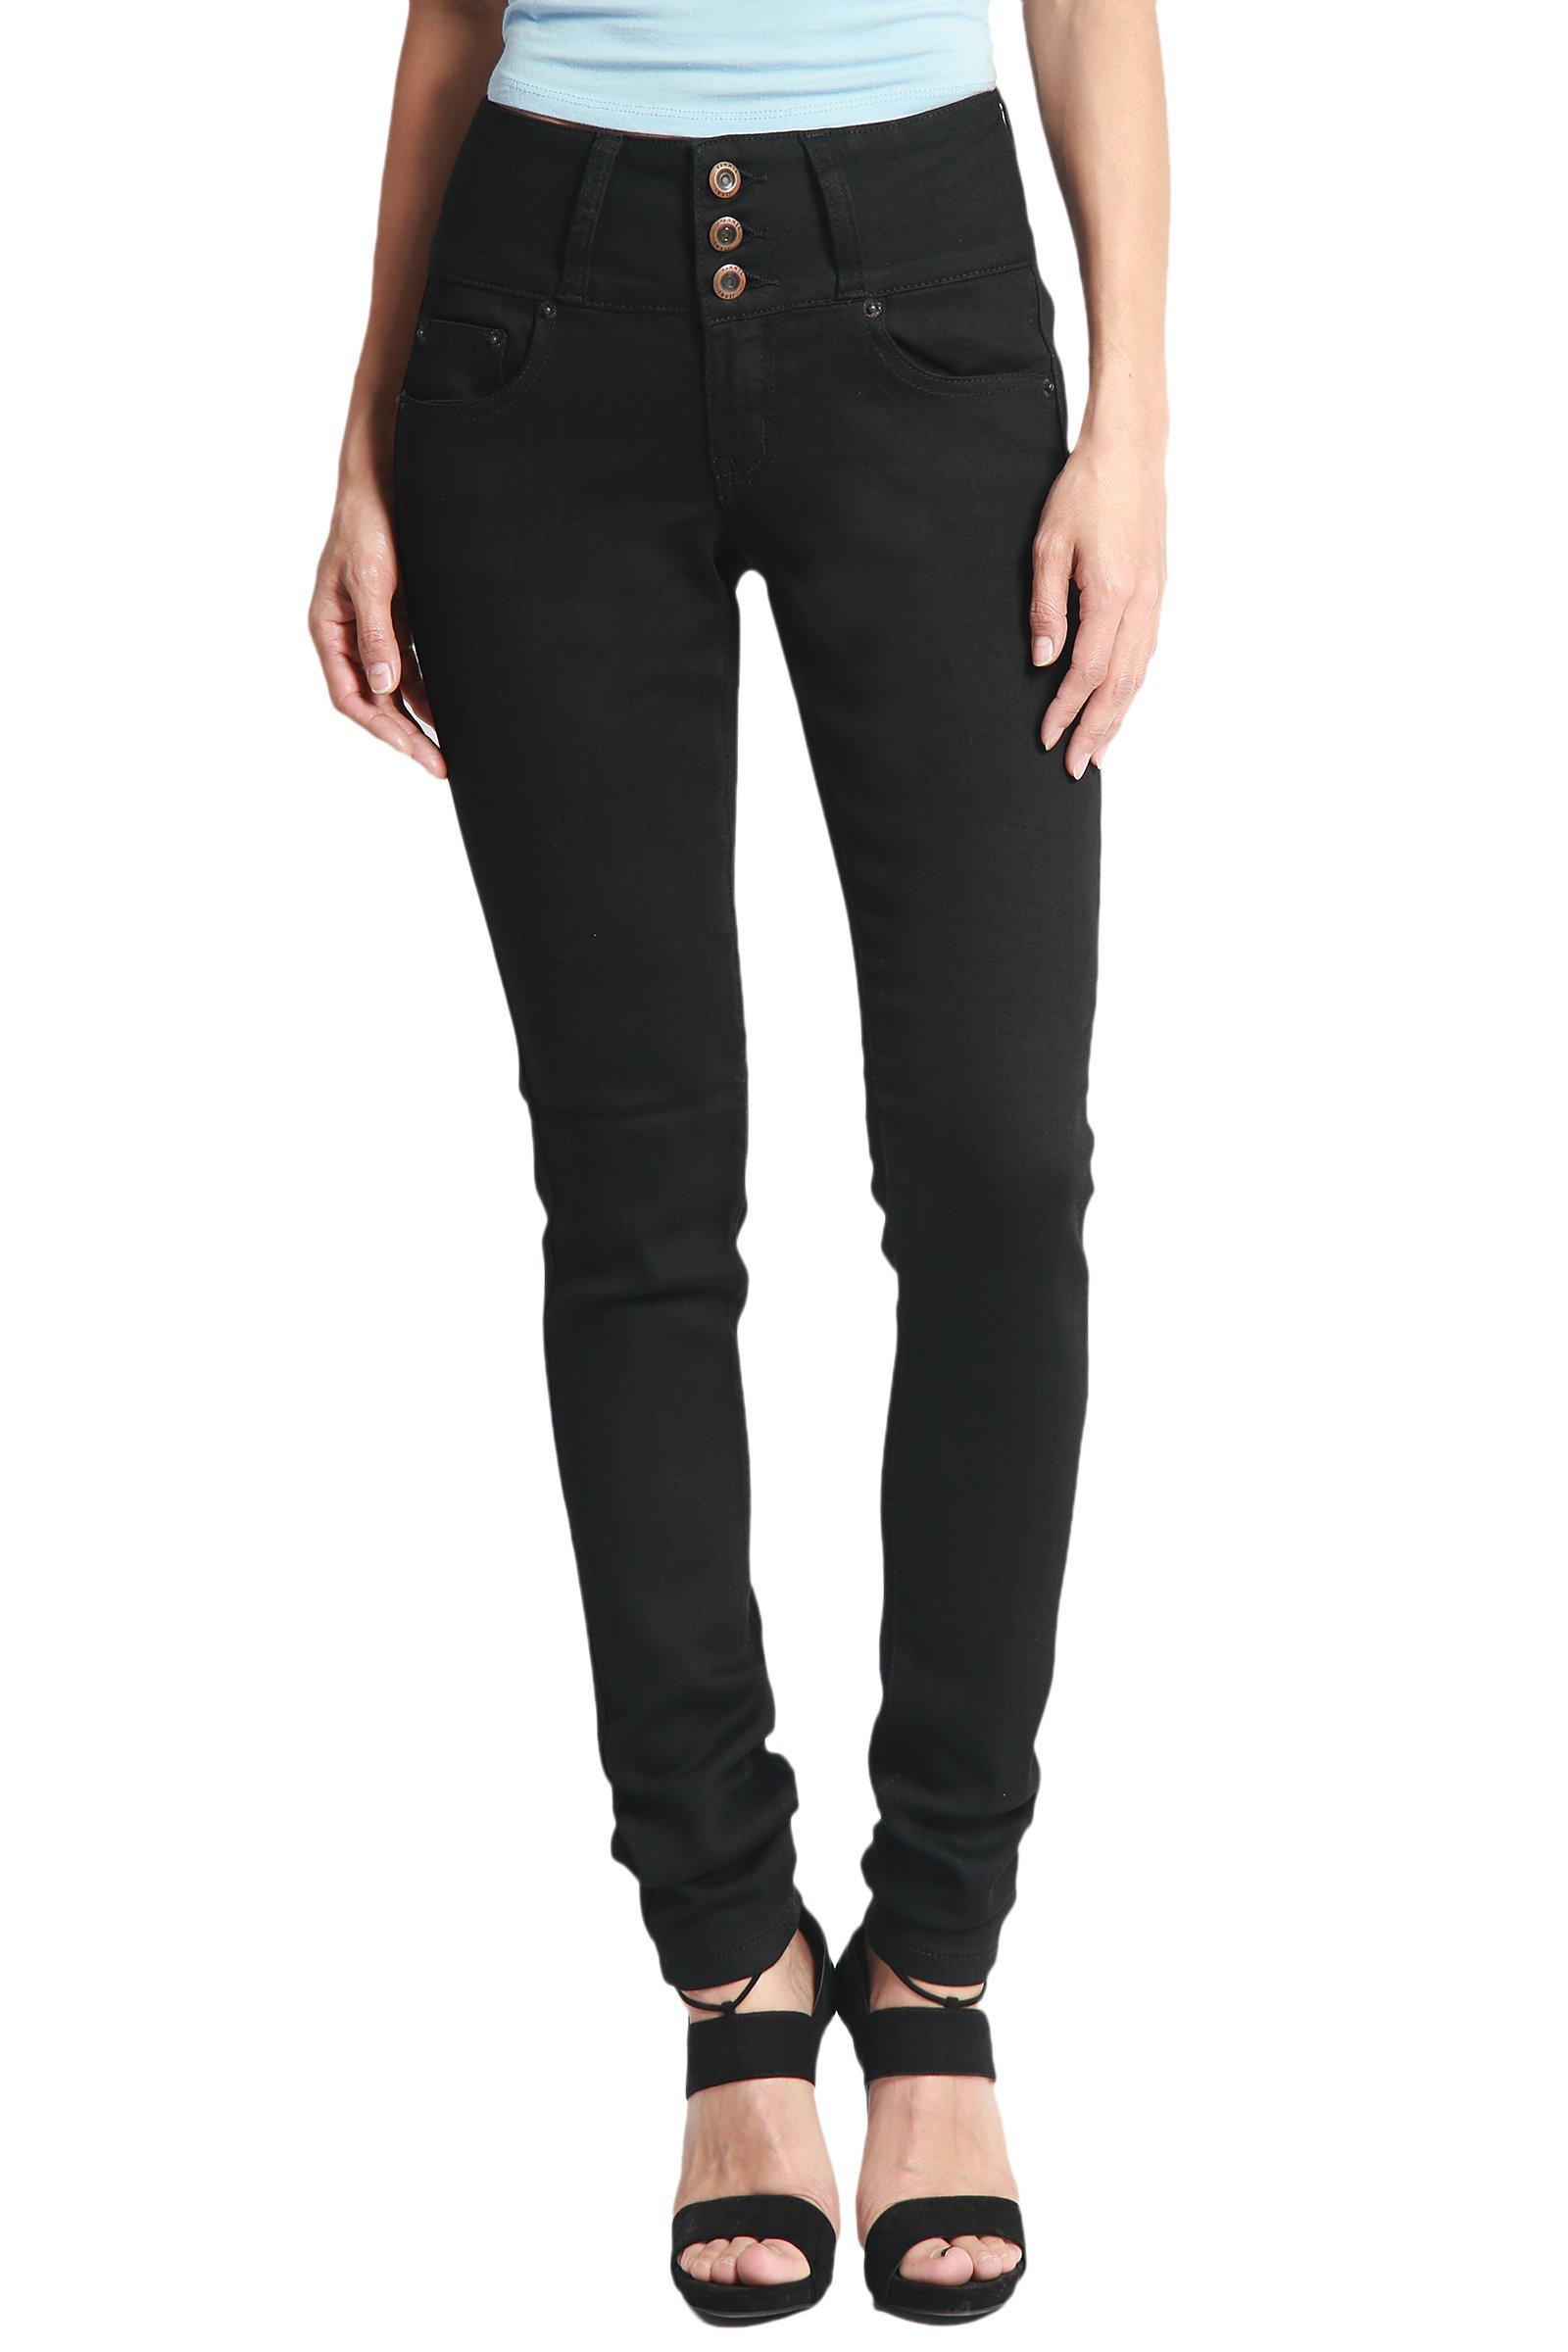 TheMogan Women's Hip Up Butt Lifting High Waist Denim Skinny Jeans Black 9